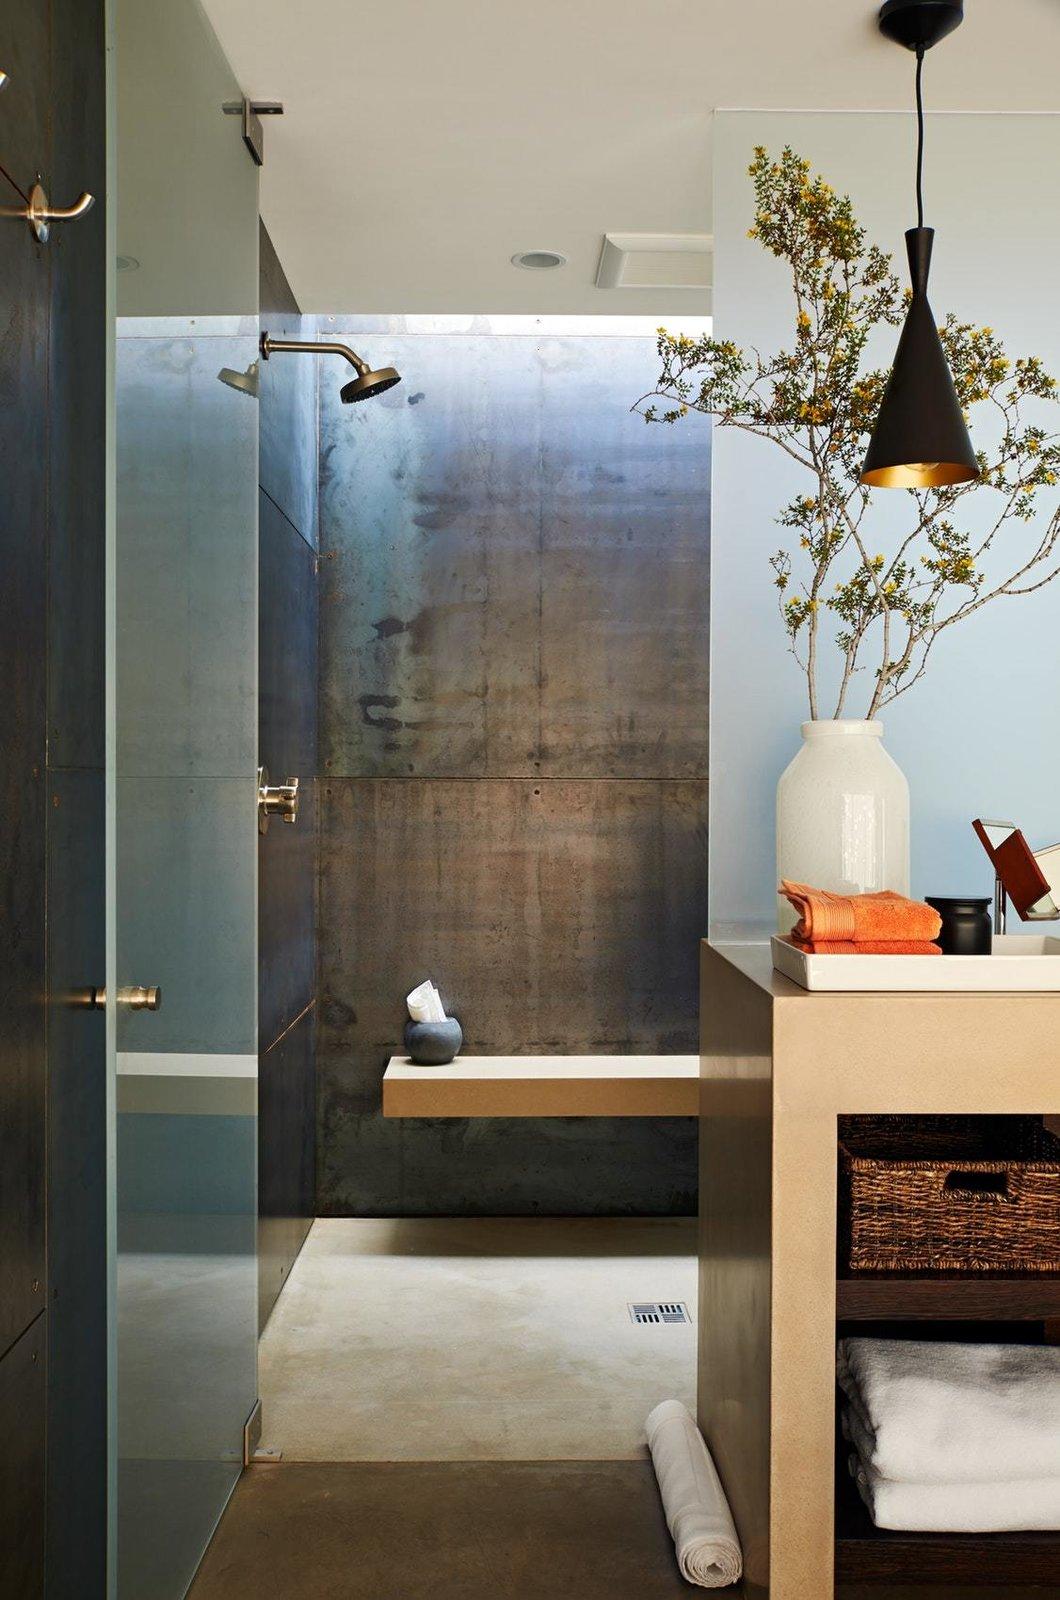 Bath Room, Pendant Lighting, Concrete Floor, Recessed Lighting, and Open Shower  On the Rocks